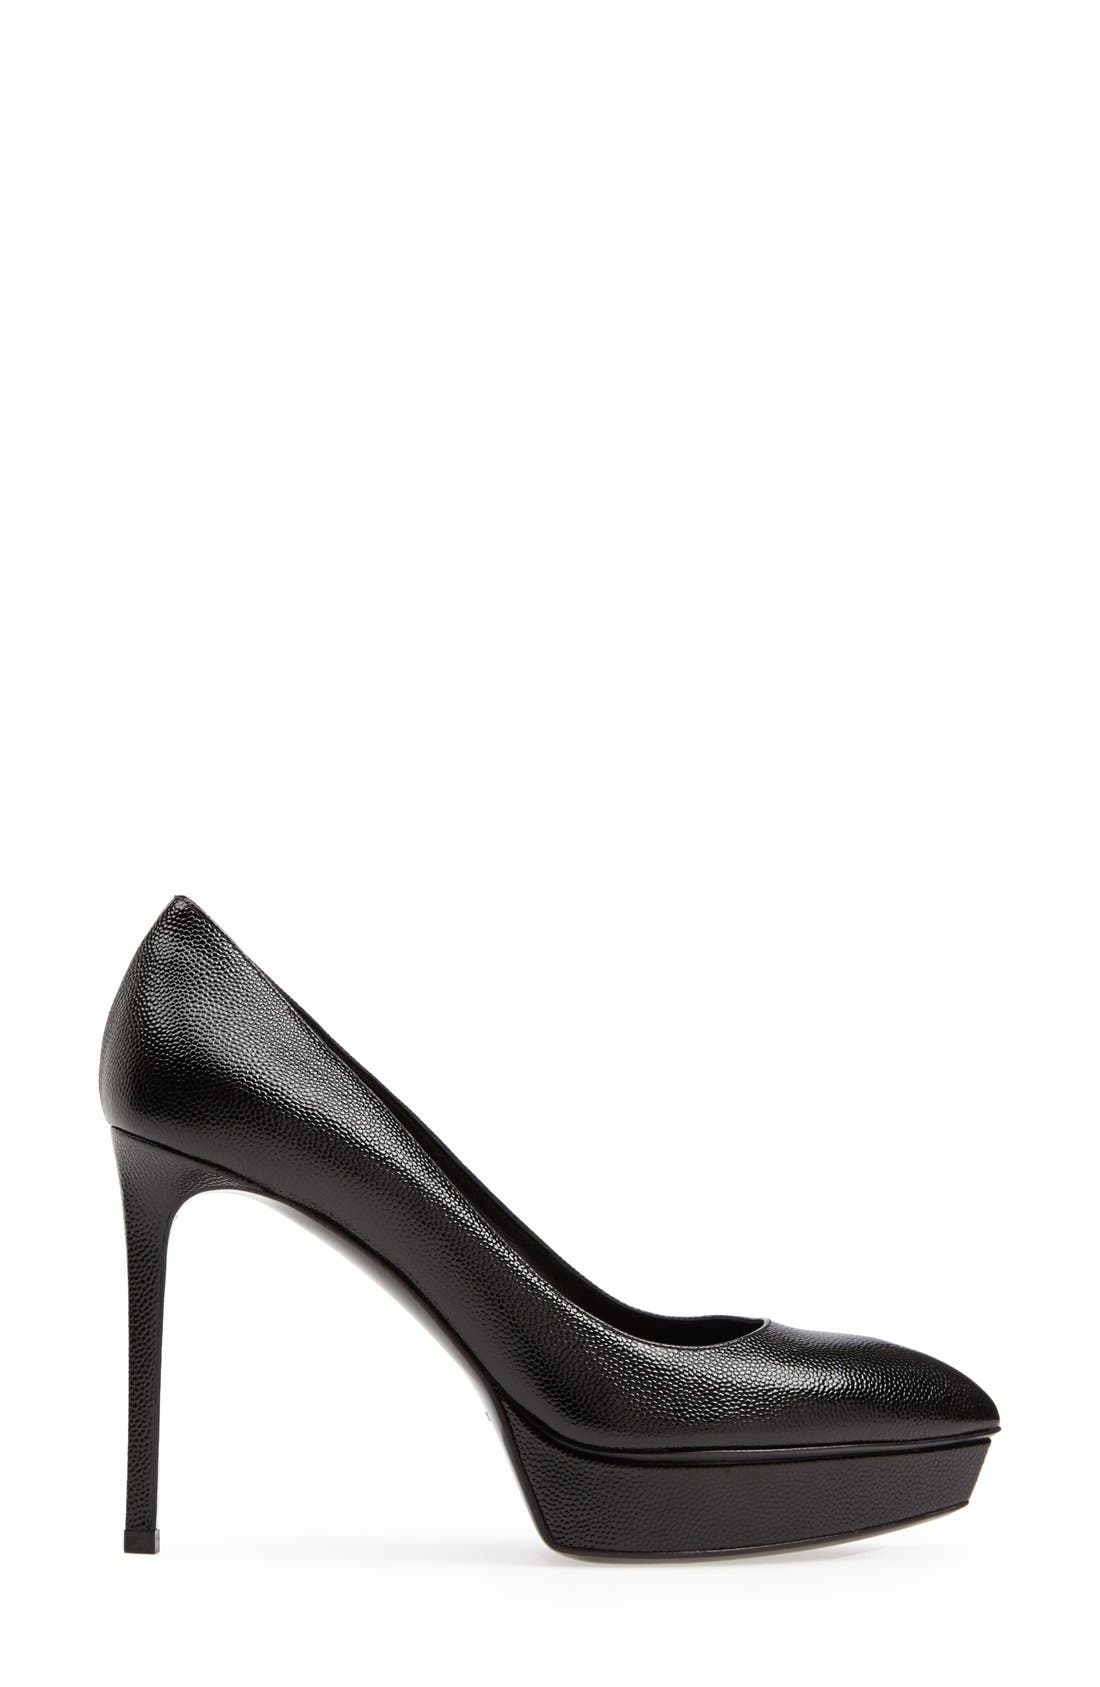 'Janis' Pointy Toe Platform Pump,                             Alternate thumbnail 4, color,                             Black